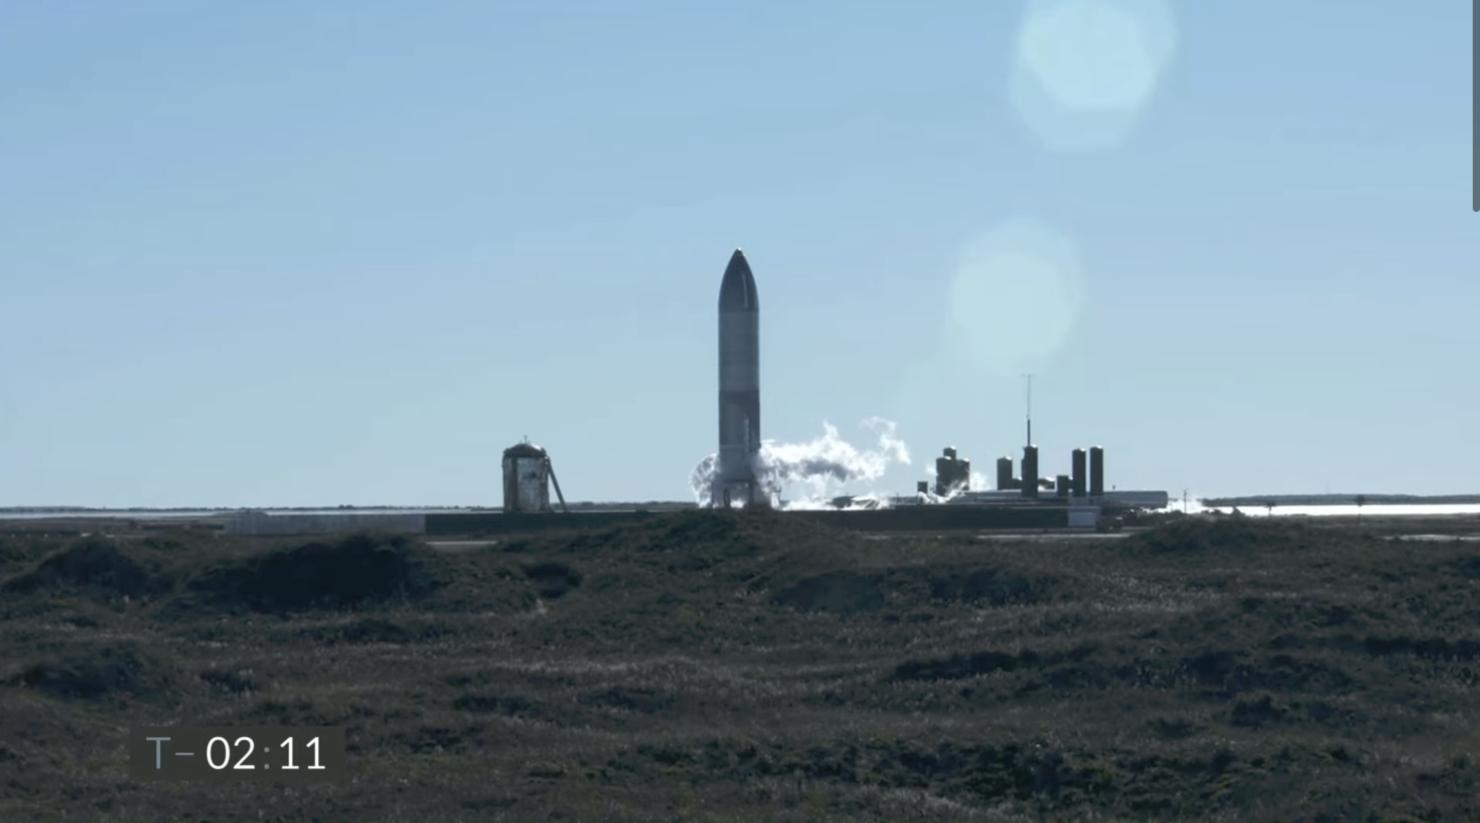 SpaceX Starship SN8 prototype